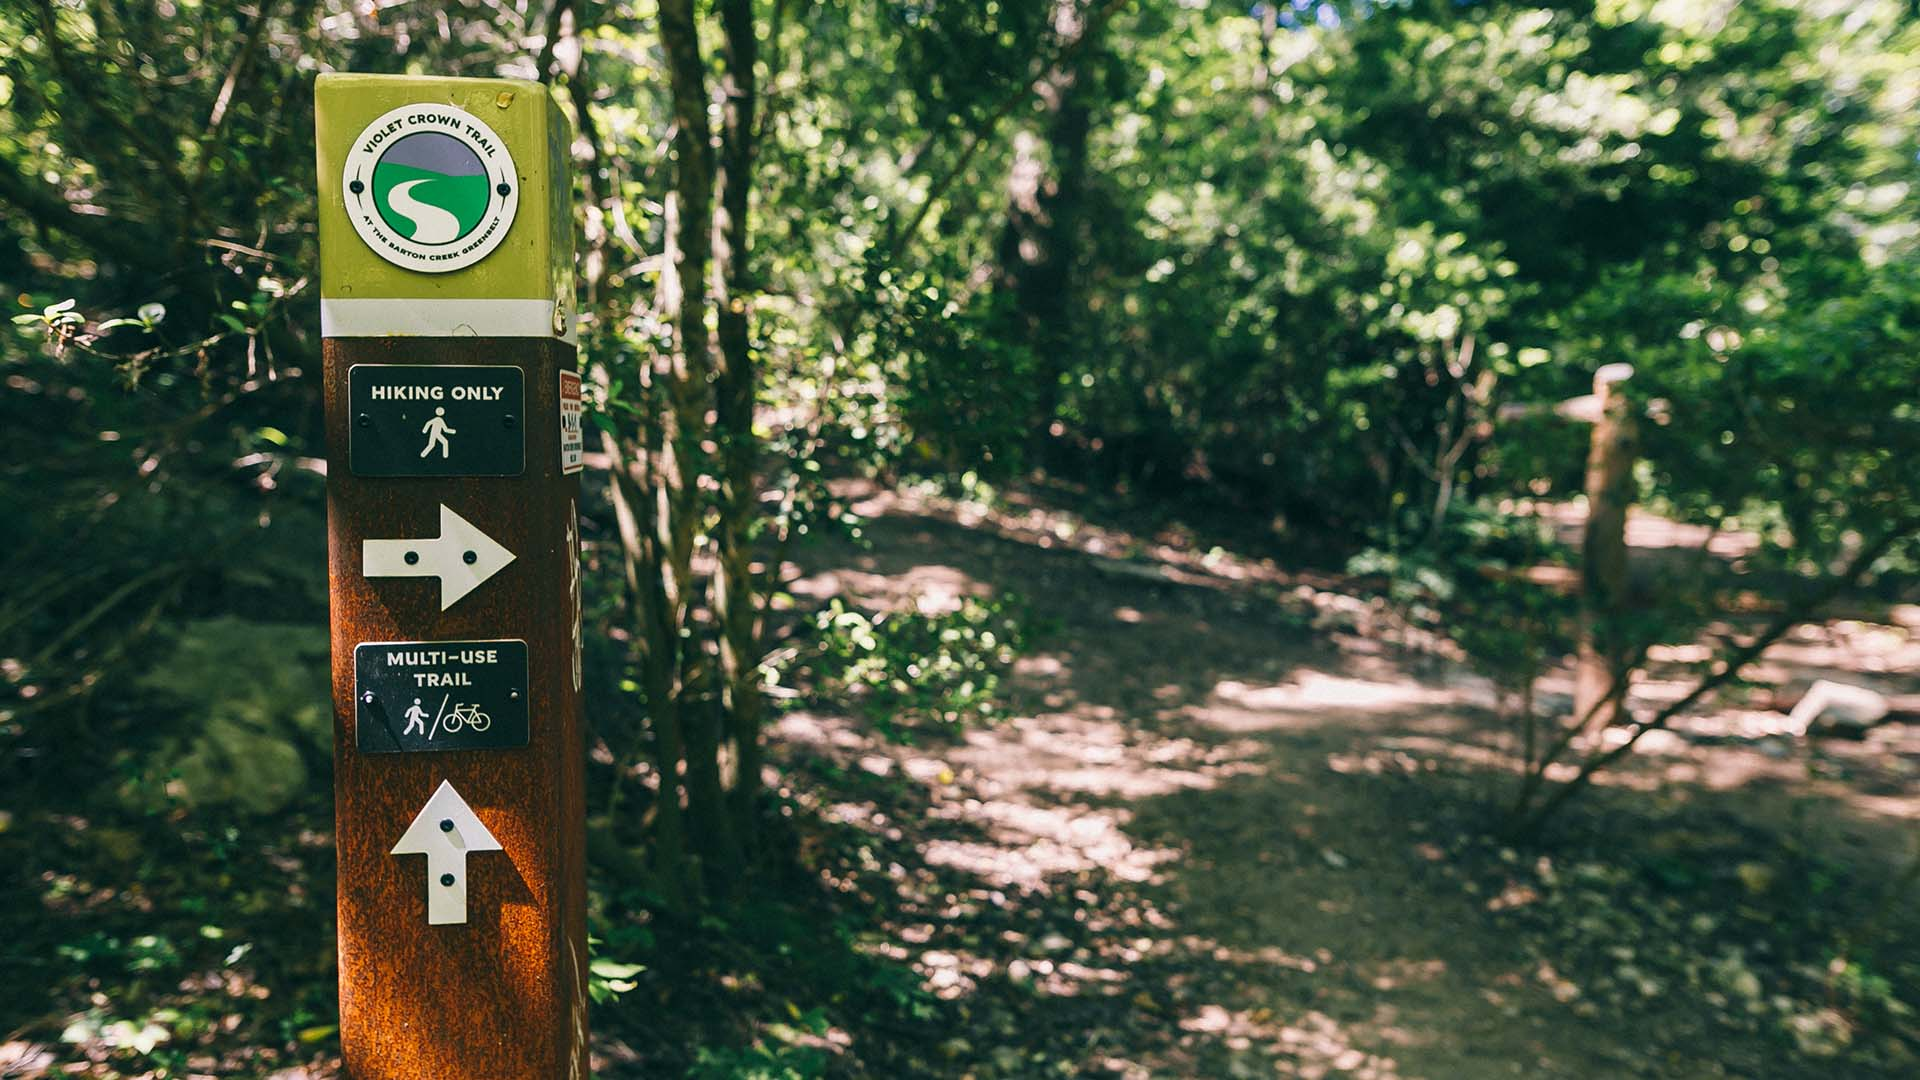 Image of Barton Creek Greenbelt Hiking Path Sign